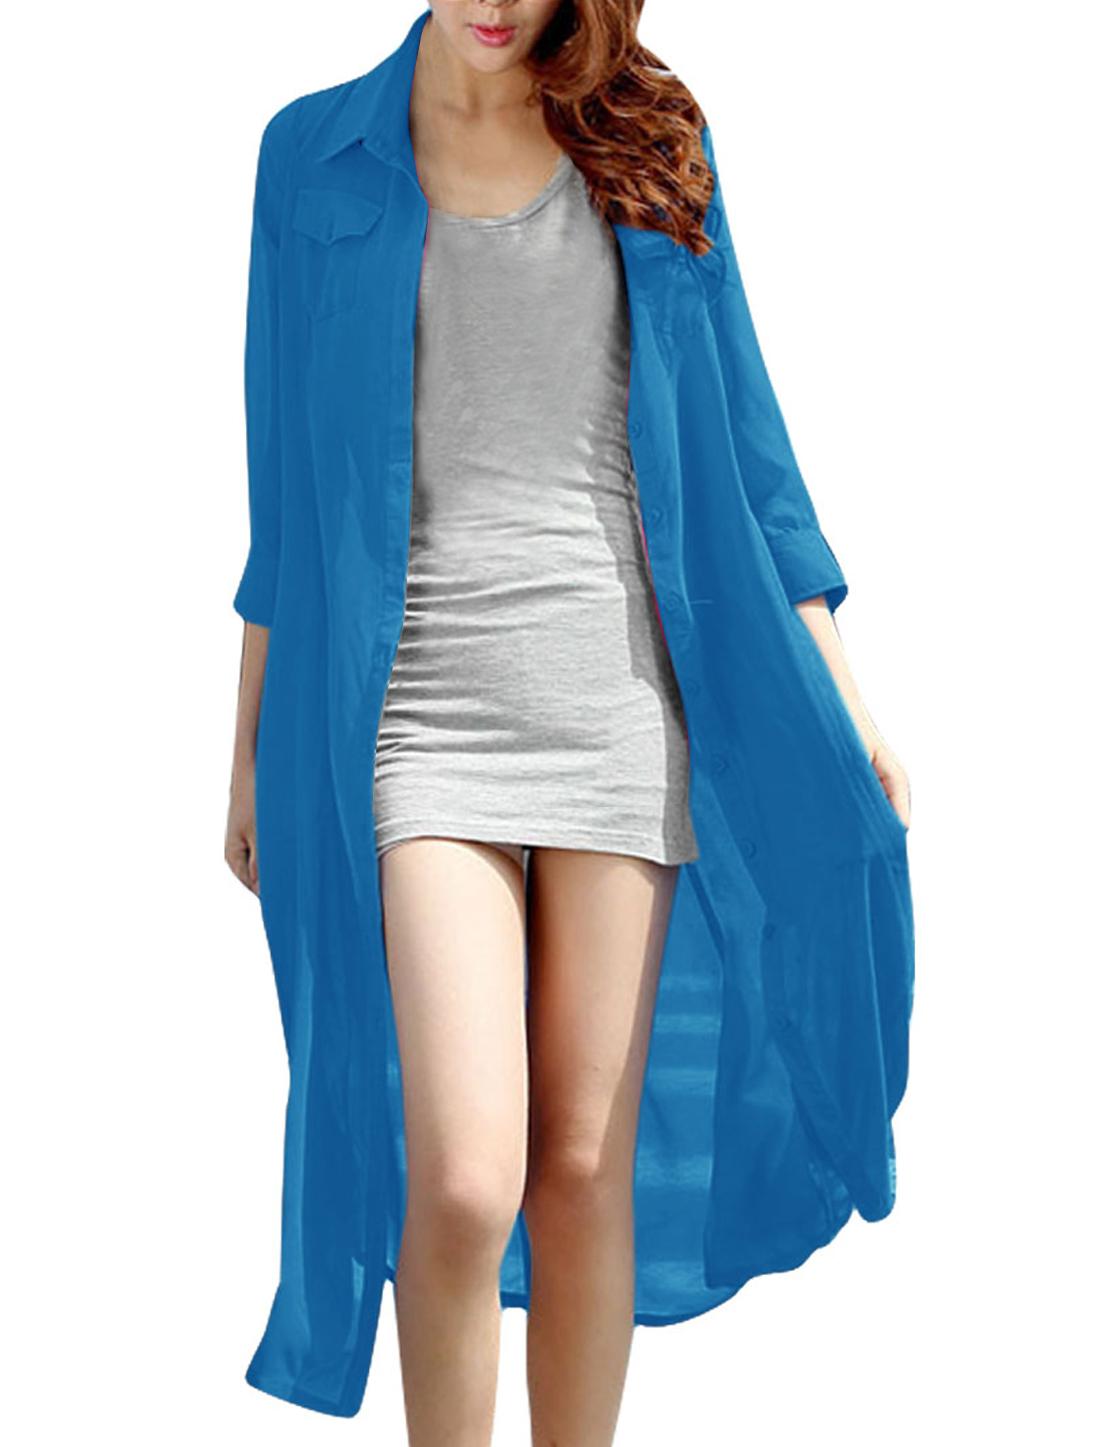 Lady Stylish Sky Blue Color Button Down Mid-calf Chiffon Shirt Dress XS